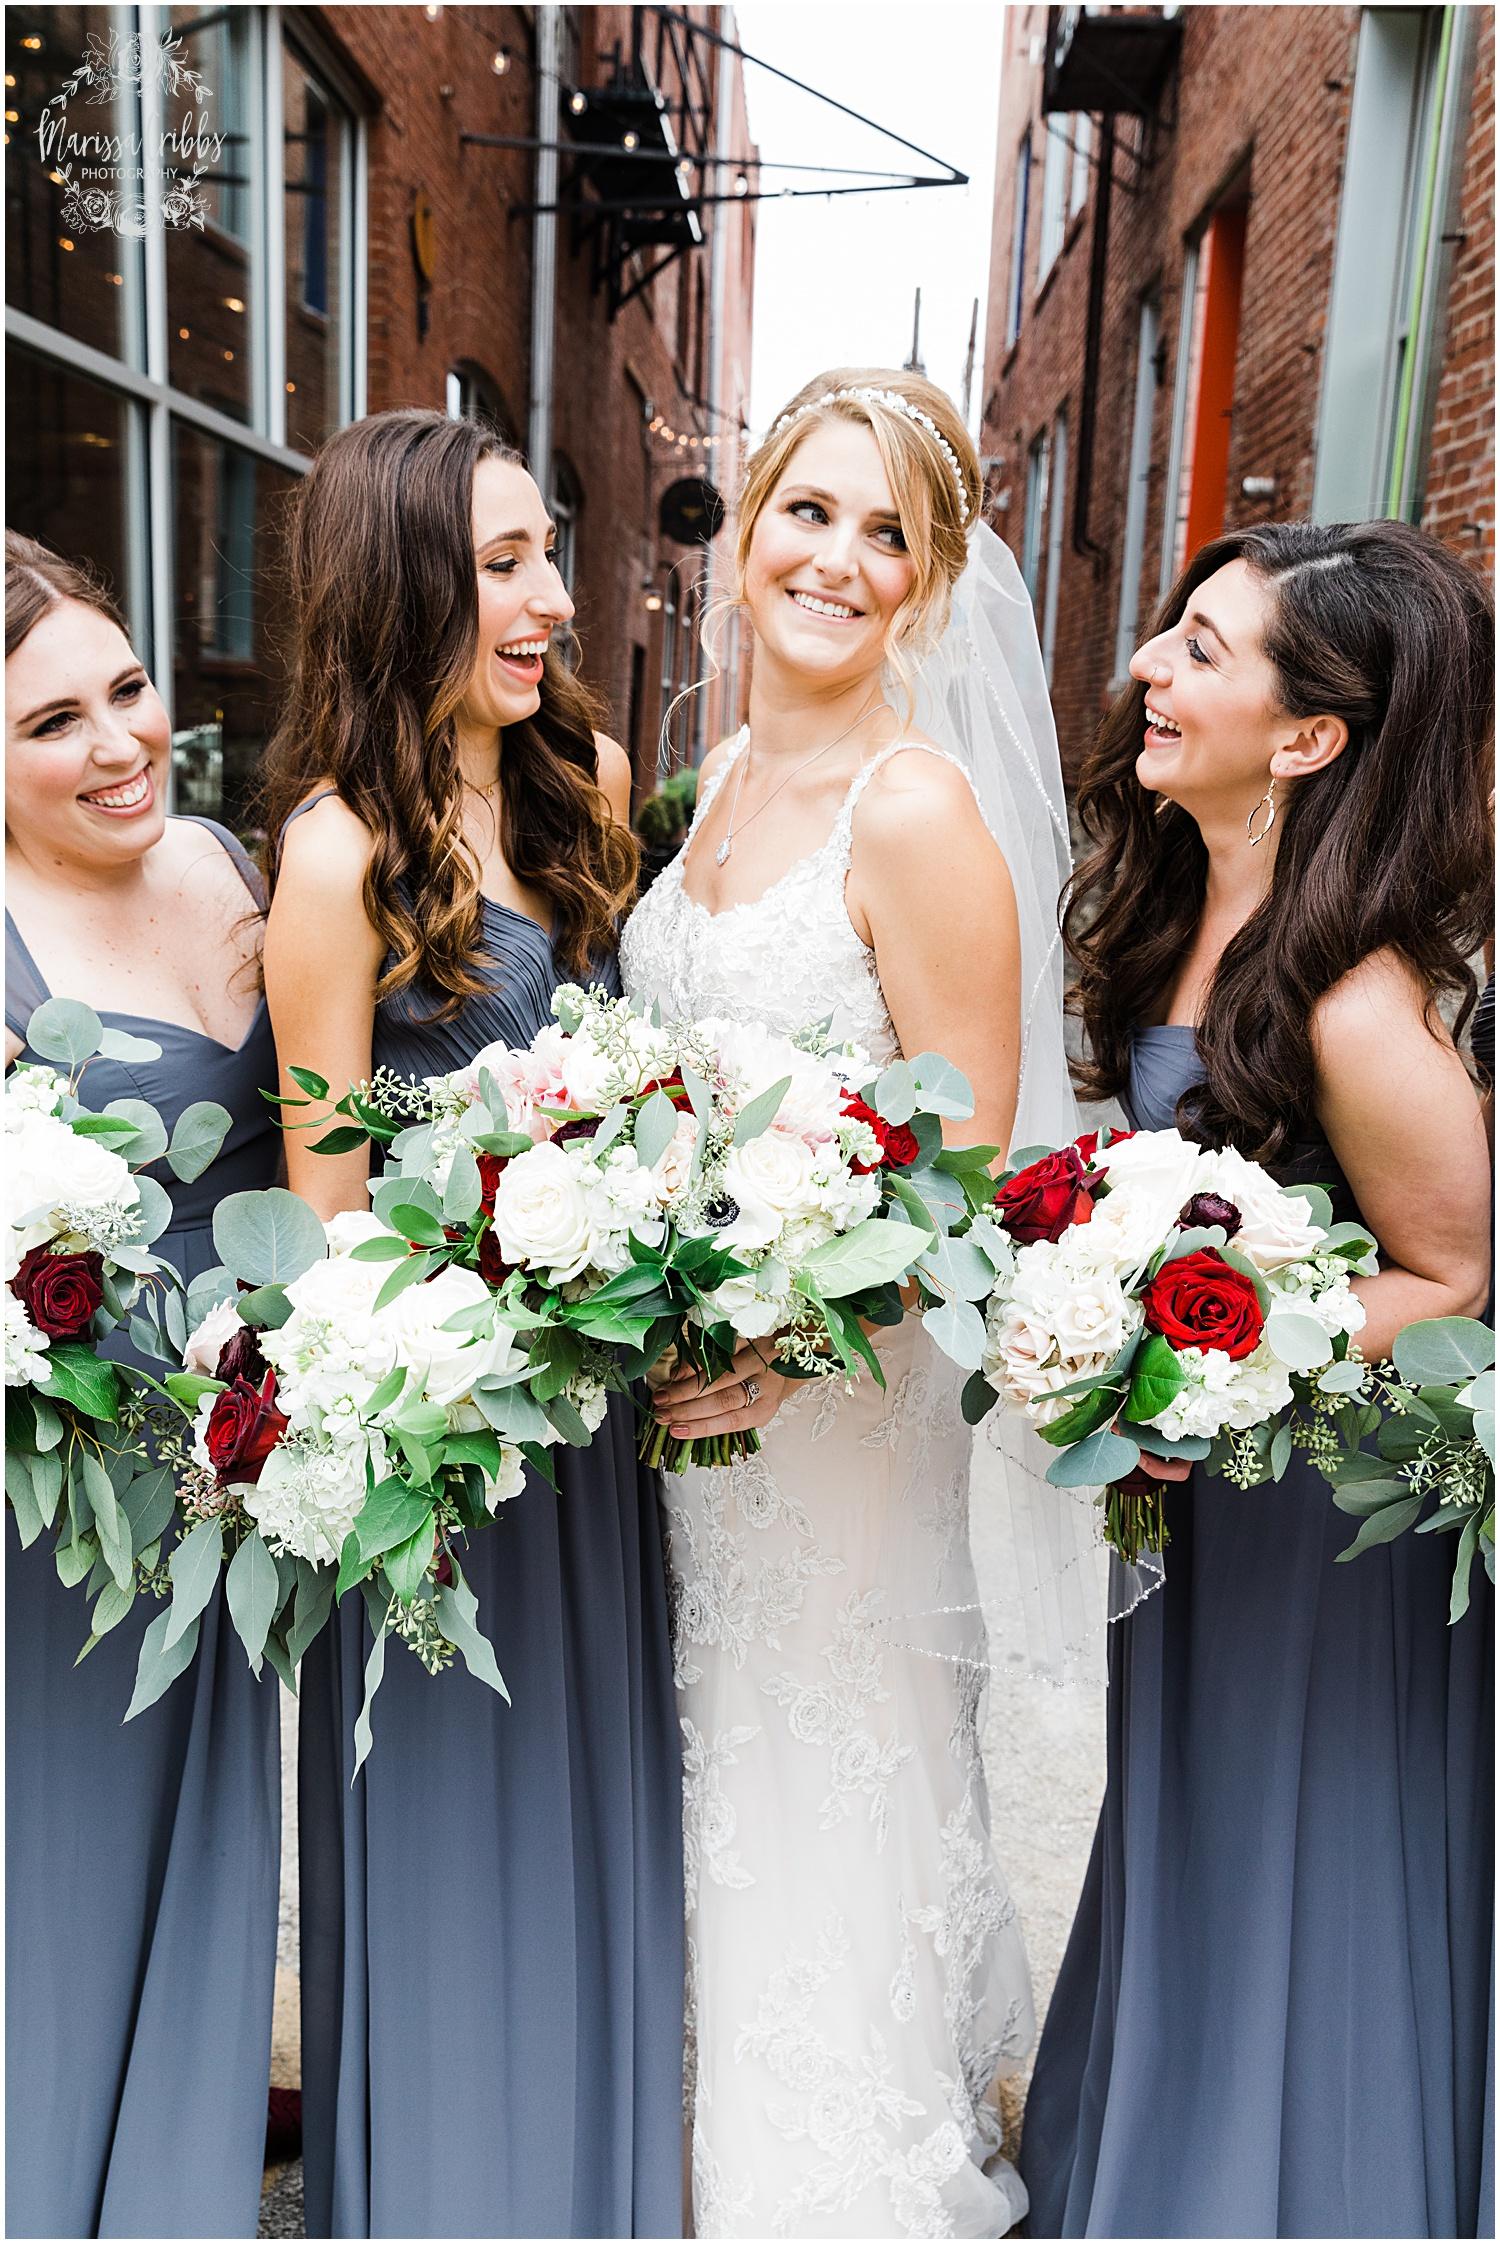 BAUER WEDDING   KELSEA & JUSTIN   MARISSA CRIBBS PHOTOGRAPHY_6519.jpg